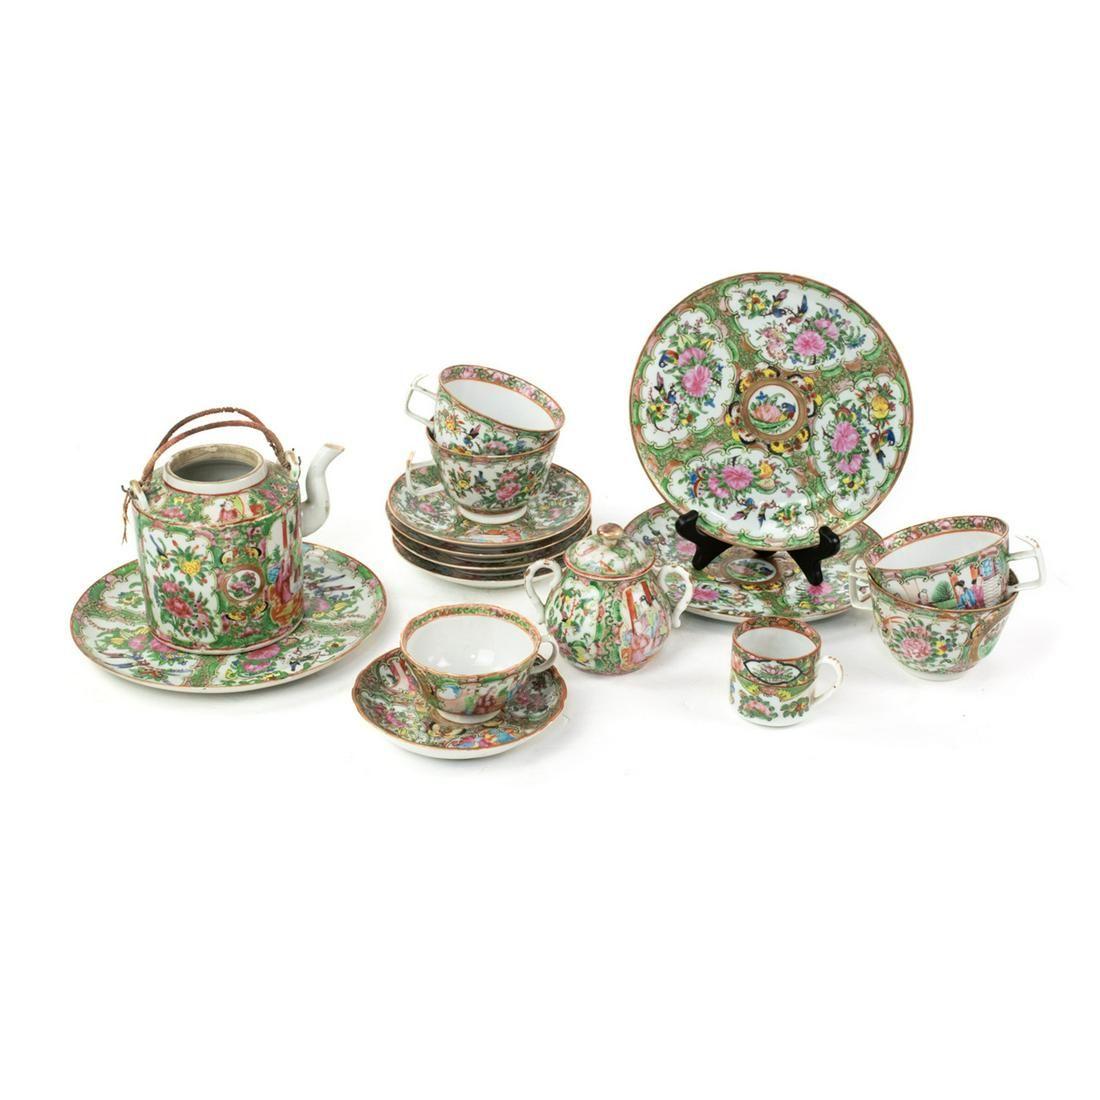 16 Pcs Chinese Export Rose Medallion Porcelain